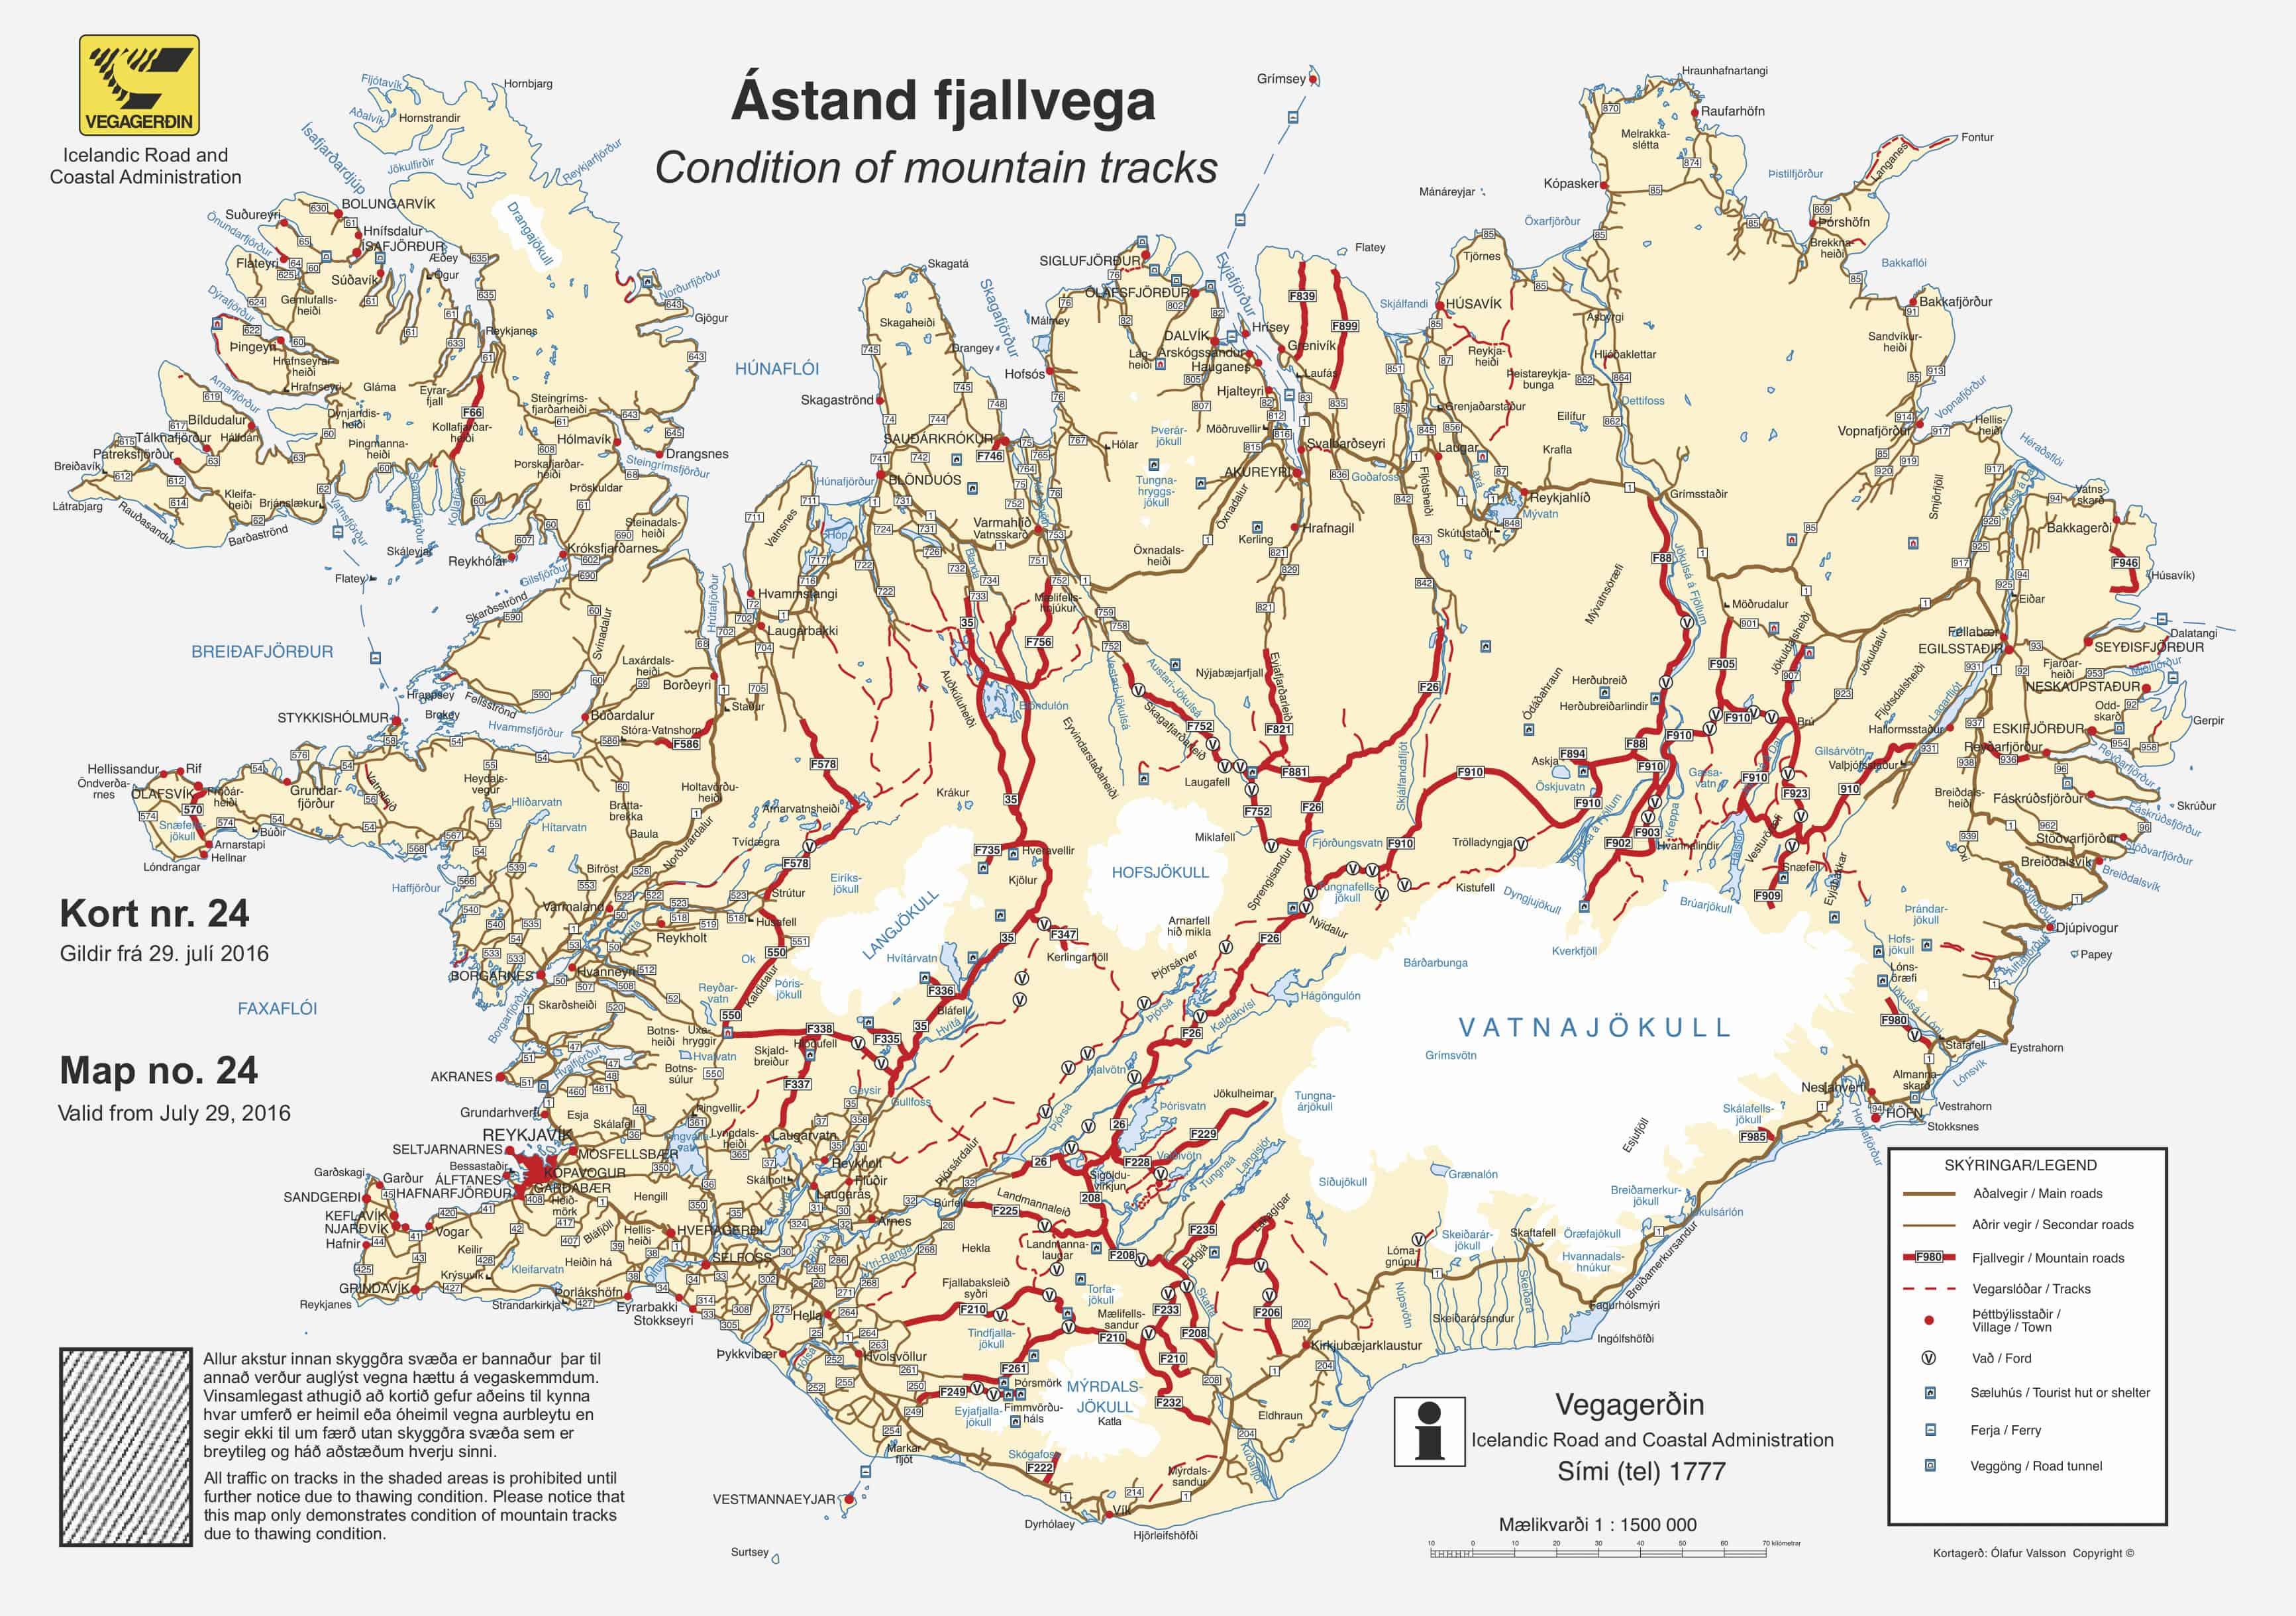 Mapa carreteras Islandia viaje ruta por Islandia Iceland road Map